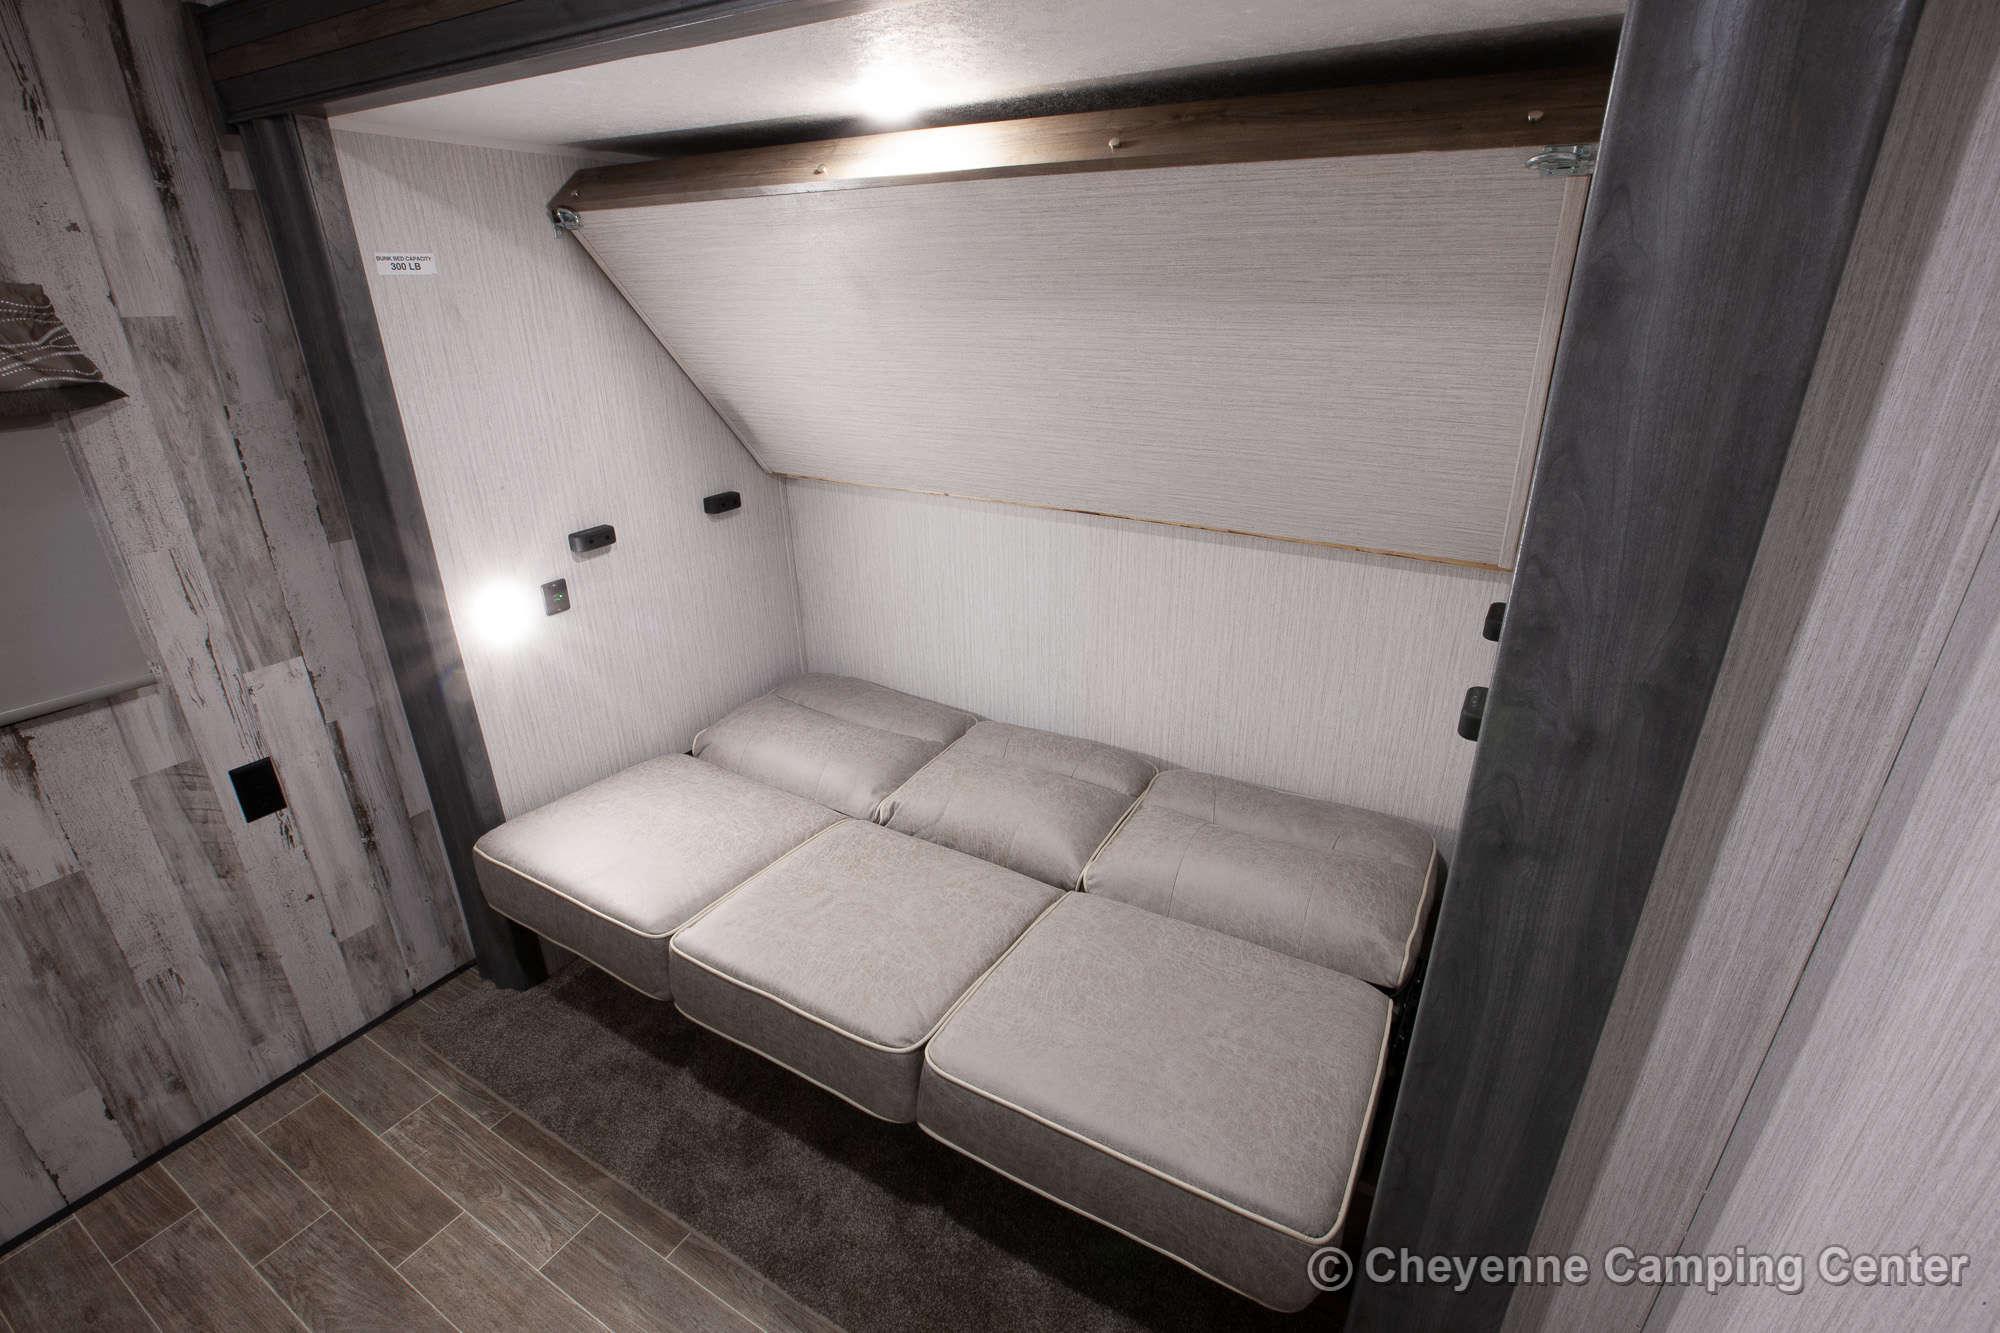 2020 Palomino Puma 32RBFQ Bunkhouse Travel Trailer Interior Image